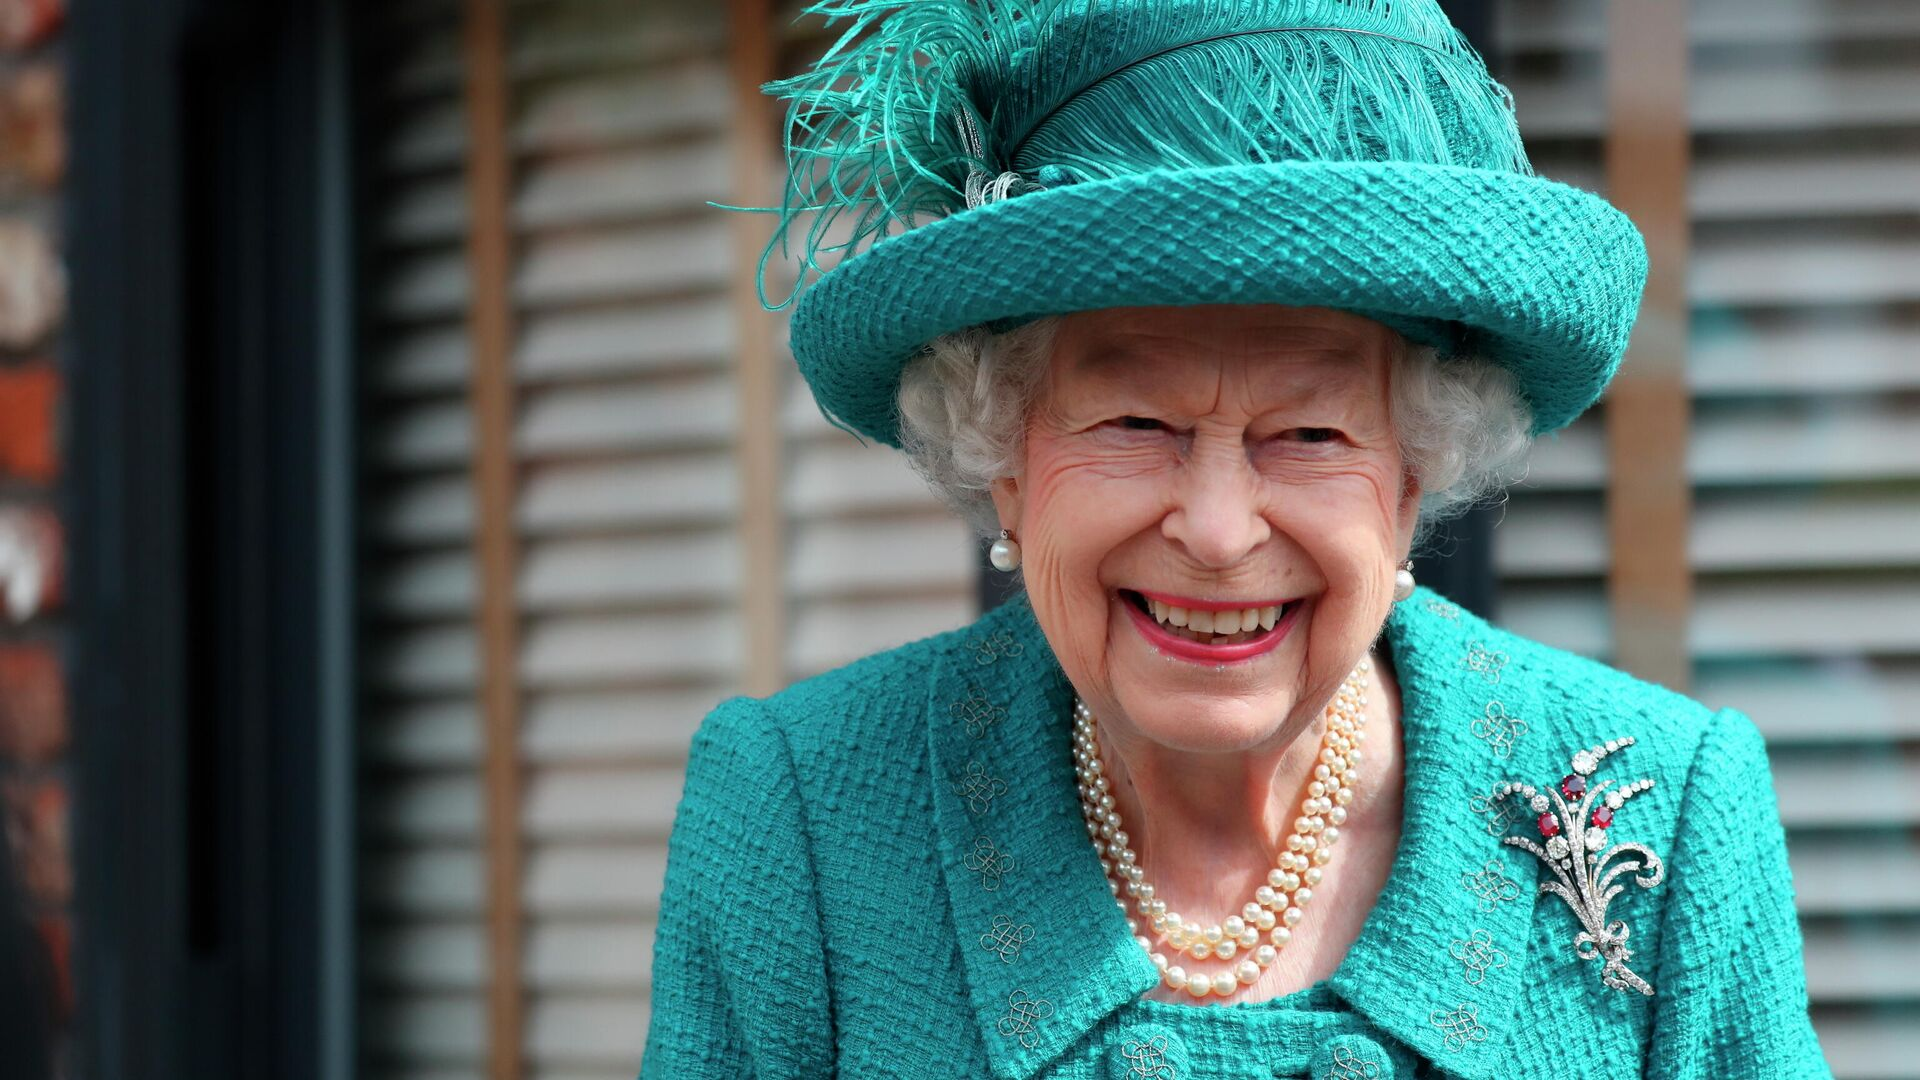 Isabel II, reina británica - Sputnik Mundo, 1920, 23.09.2021